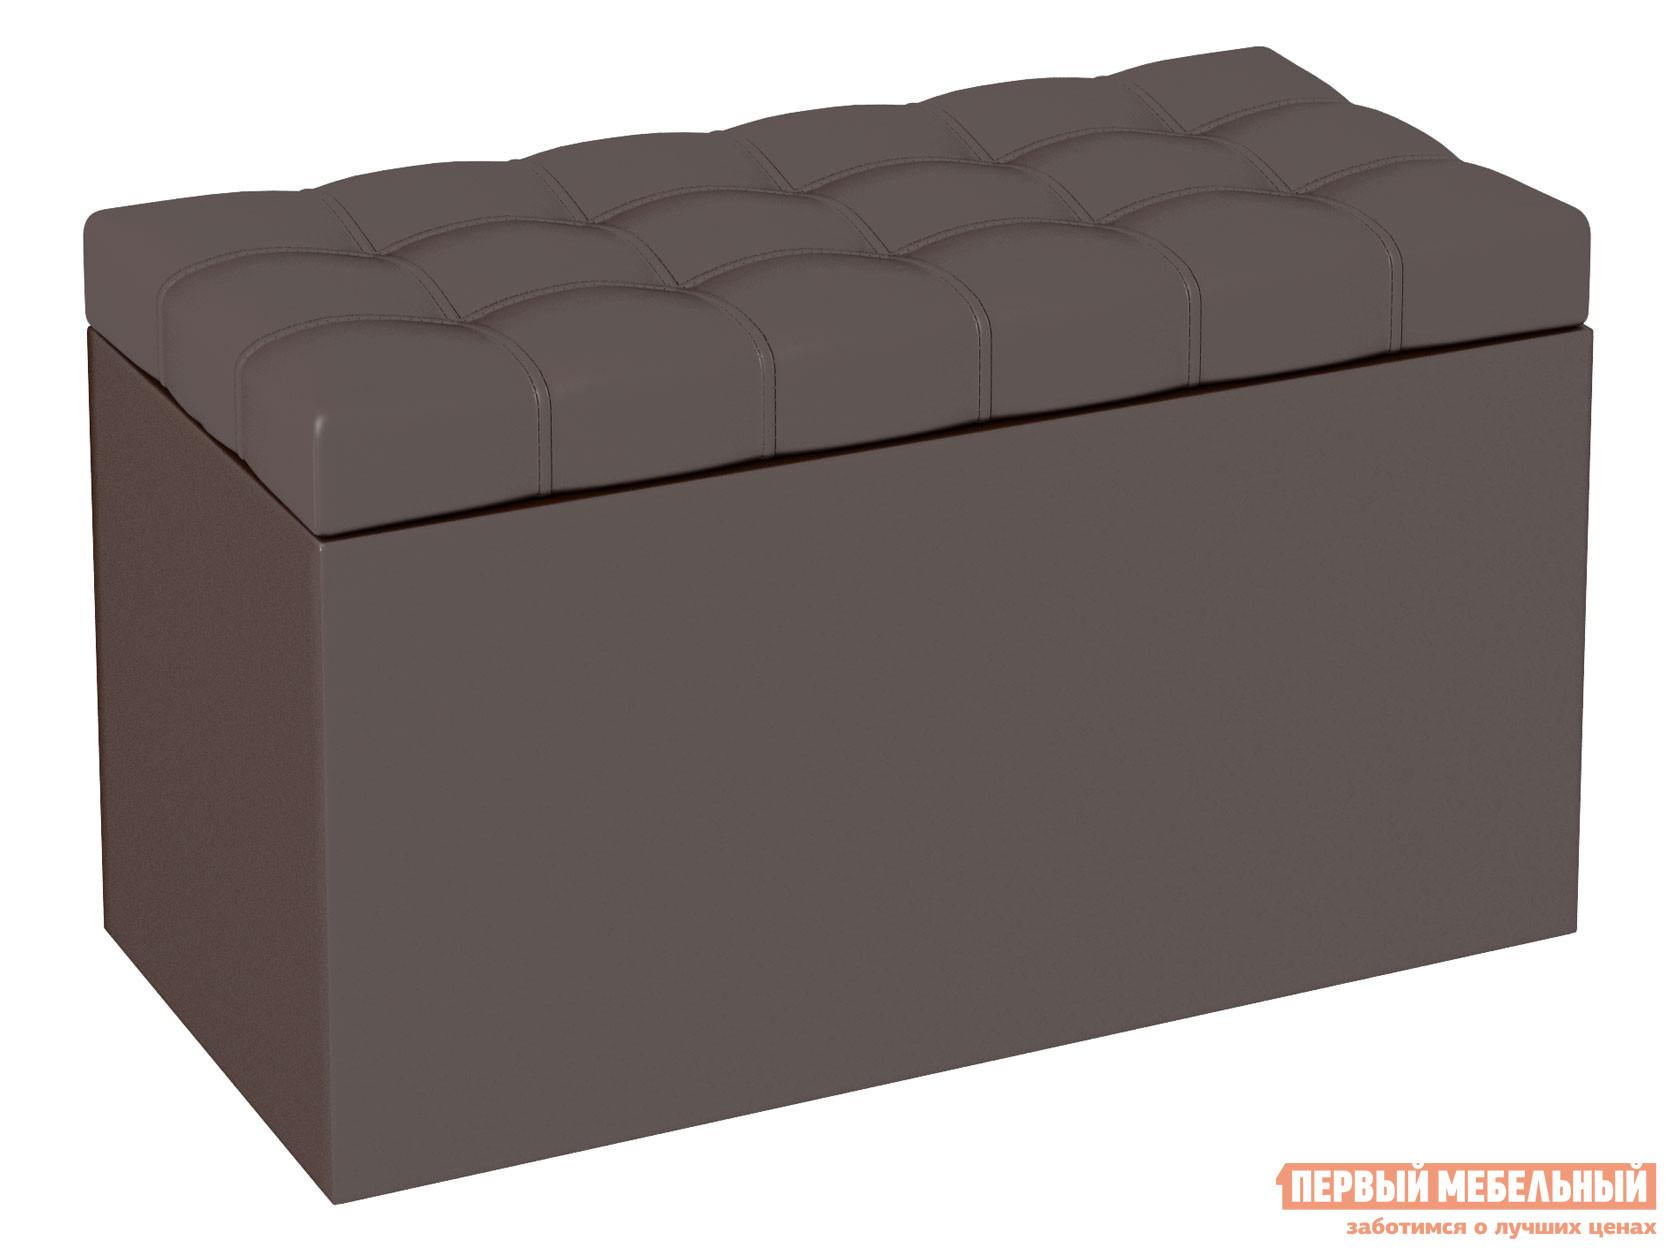 Банкетка  Пуф-сундук Квадро Шоколадный, кожзам БОНмебель 87363